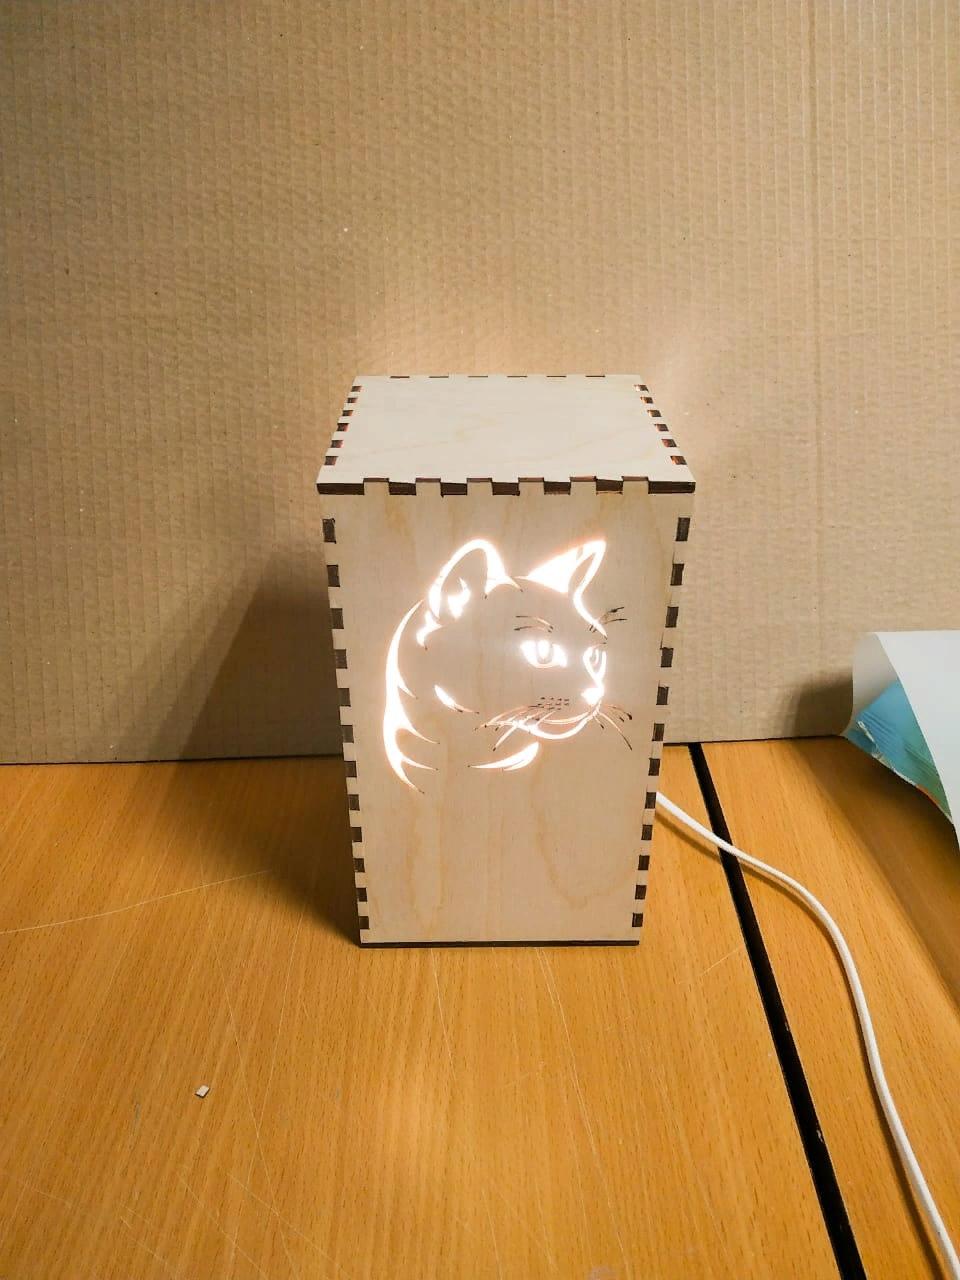 Laser Cut Kitty Cat Night Light Lamp Free Vector